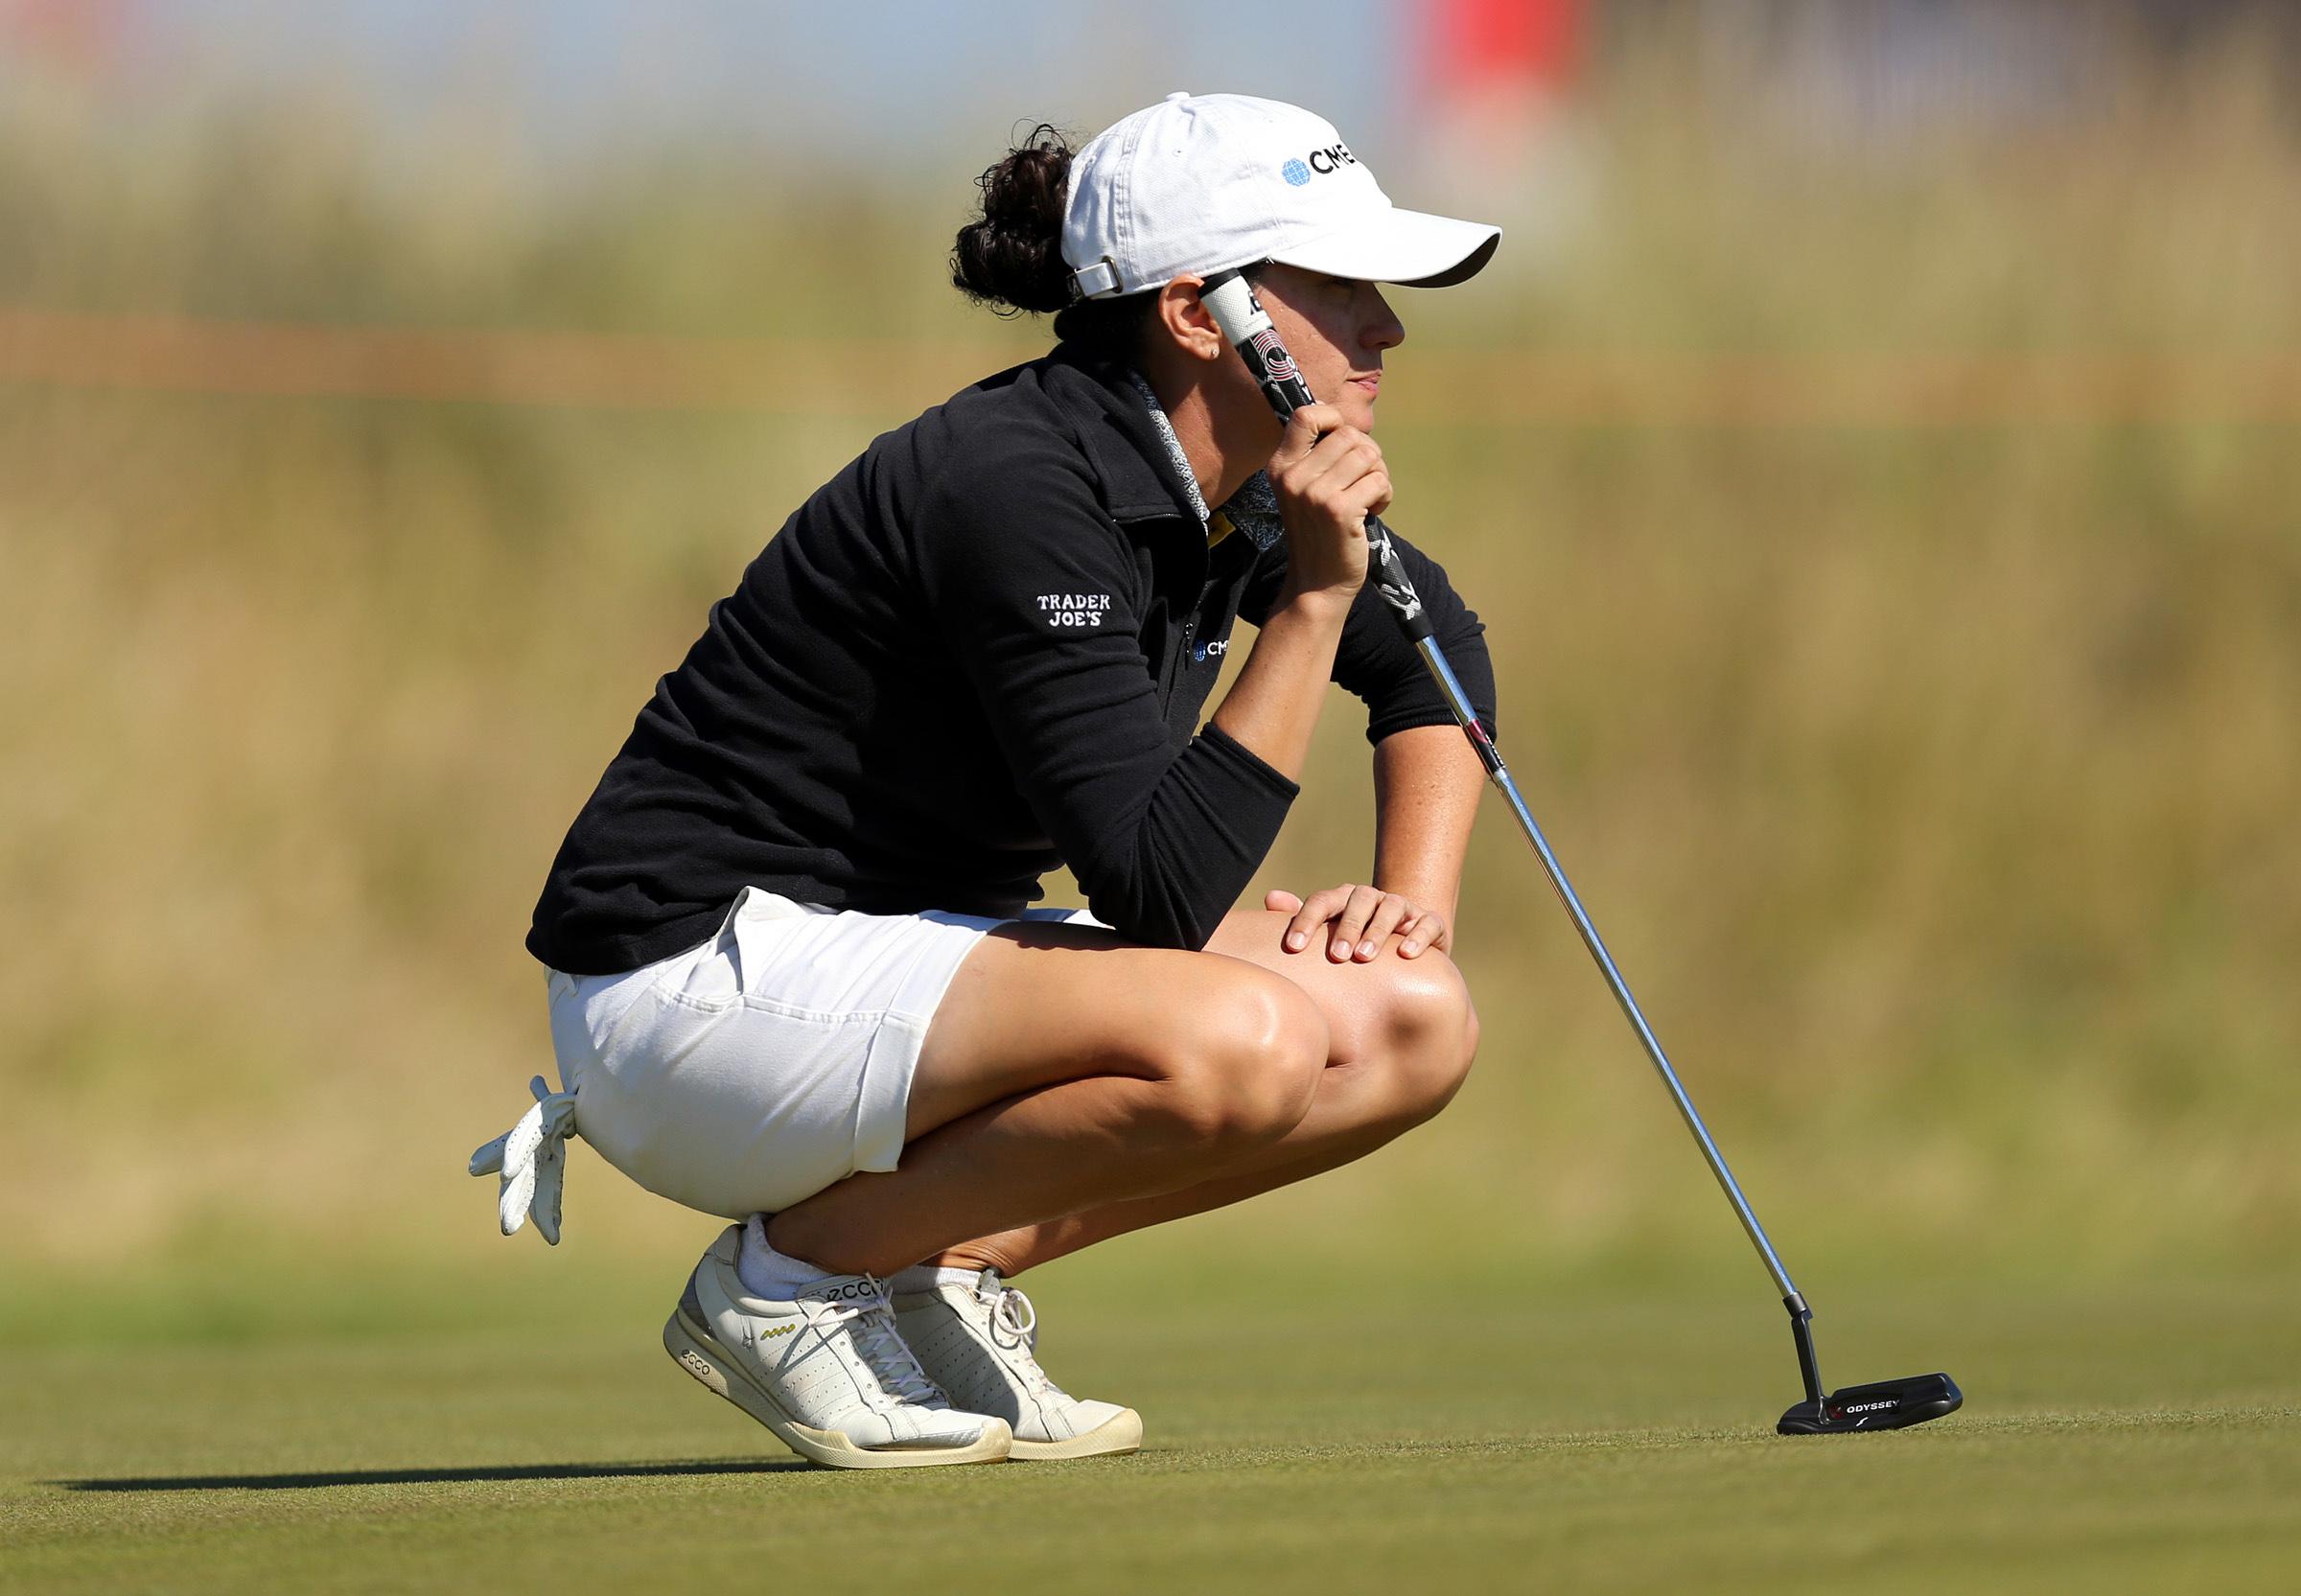 Martin takes 3-shot lead at Women's British Open